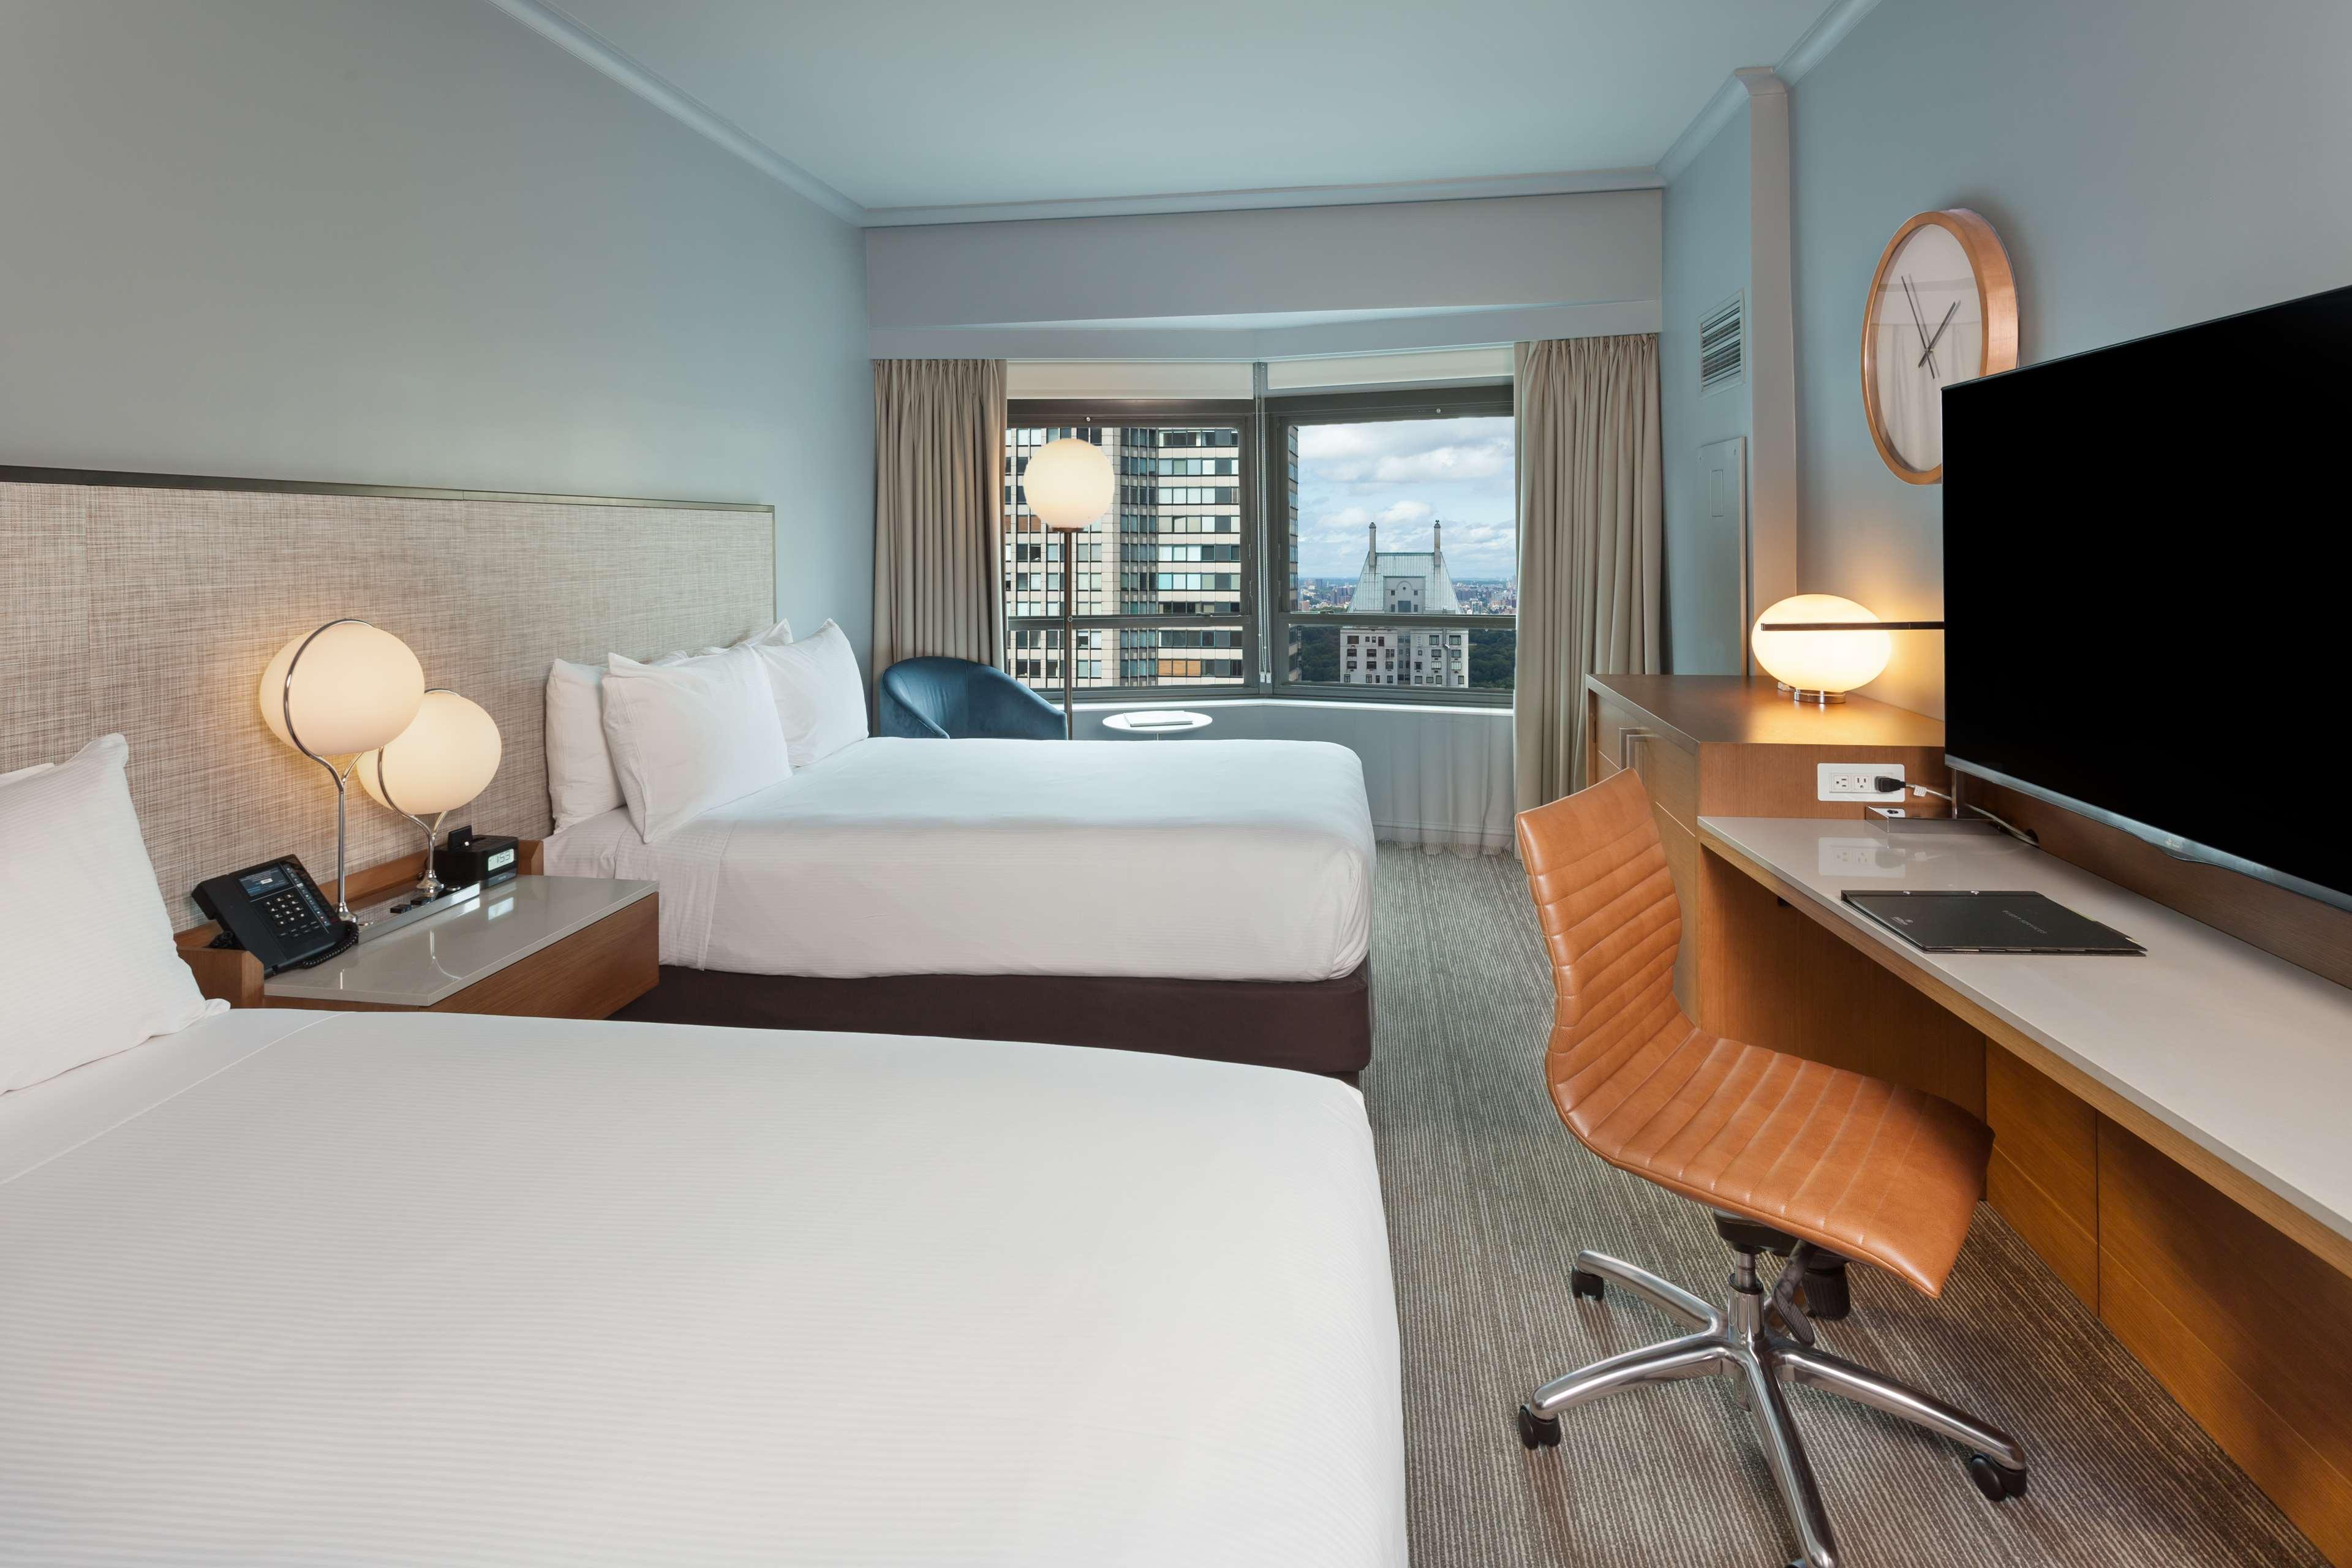 New York Hilton Midtown image 35